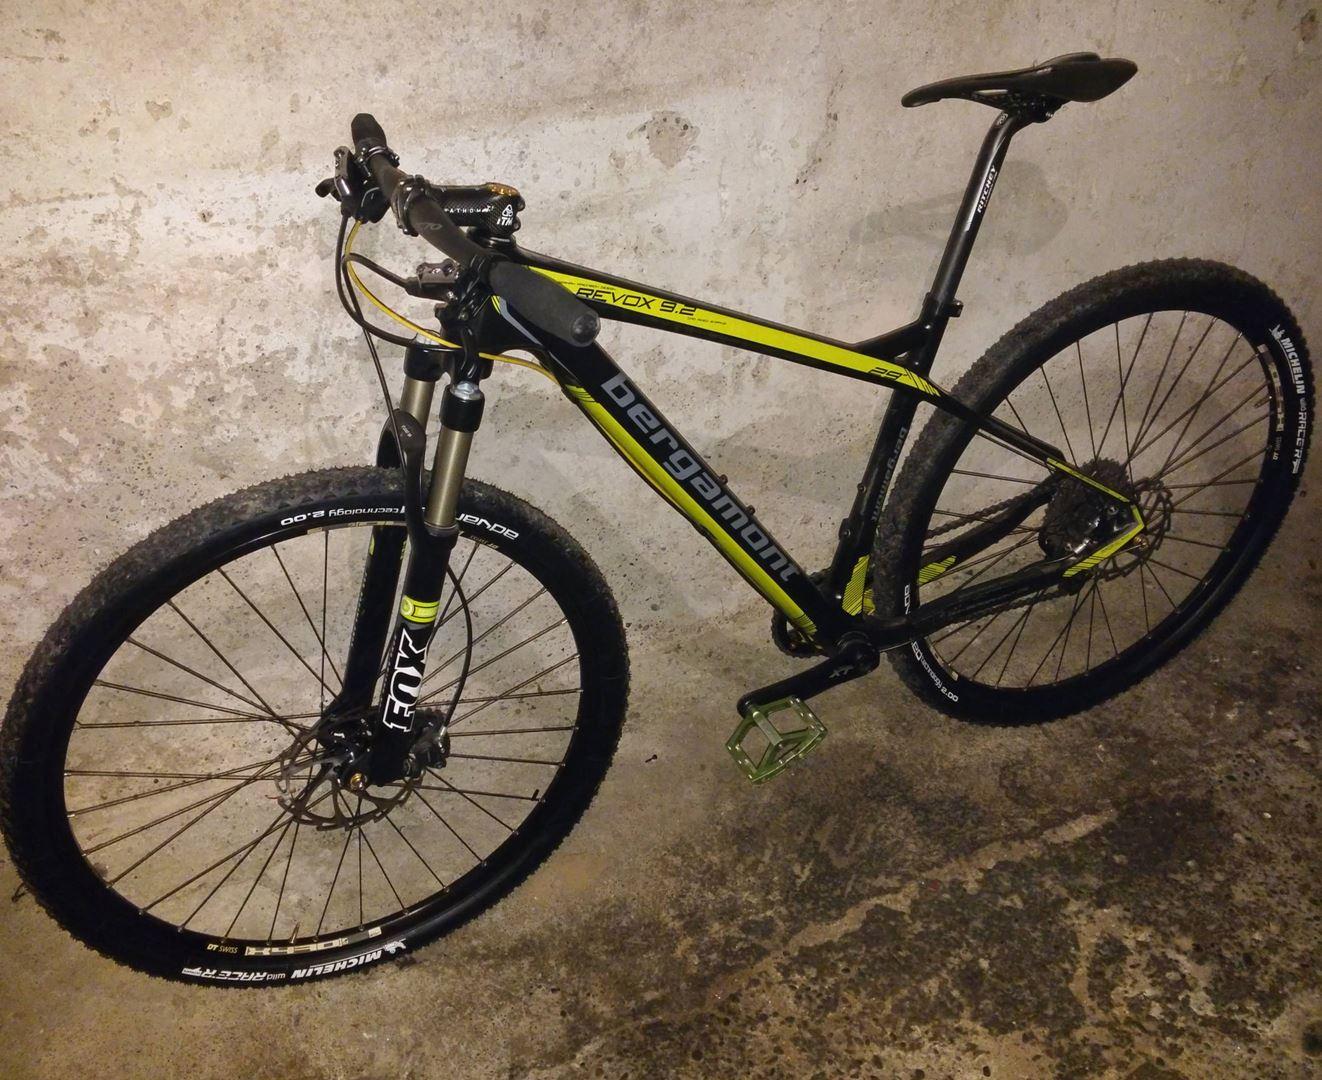 bergamont revox 9 2 hardtail carbon mtb rahmen 29 bike. Black Bedroom Furniture Sets. Home Design Ideas